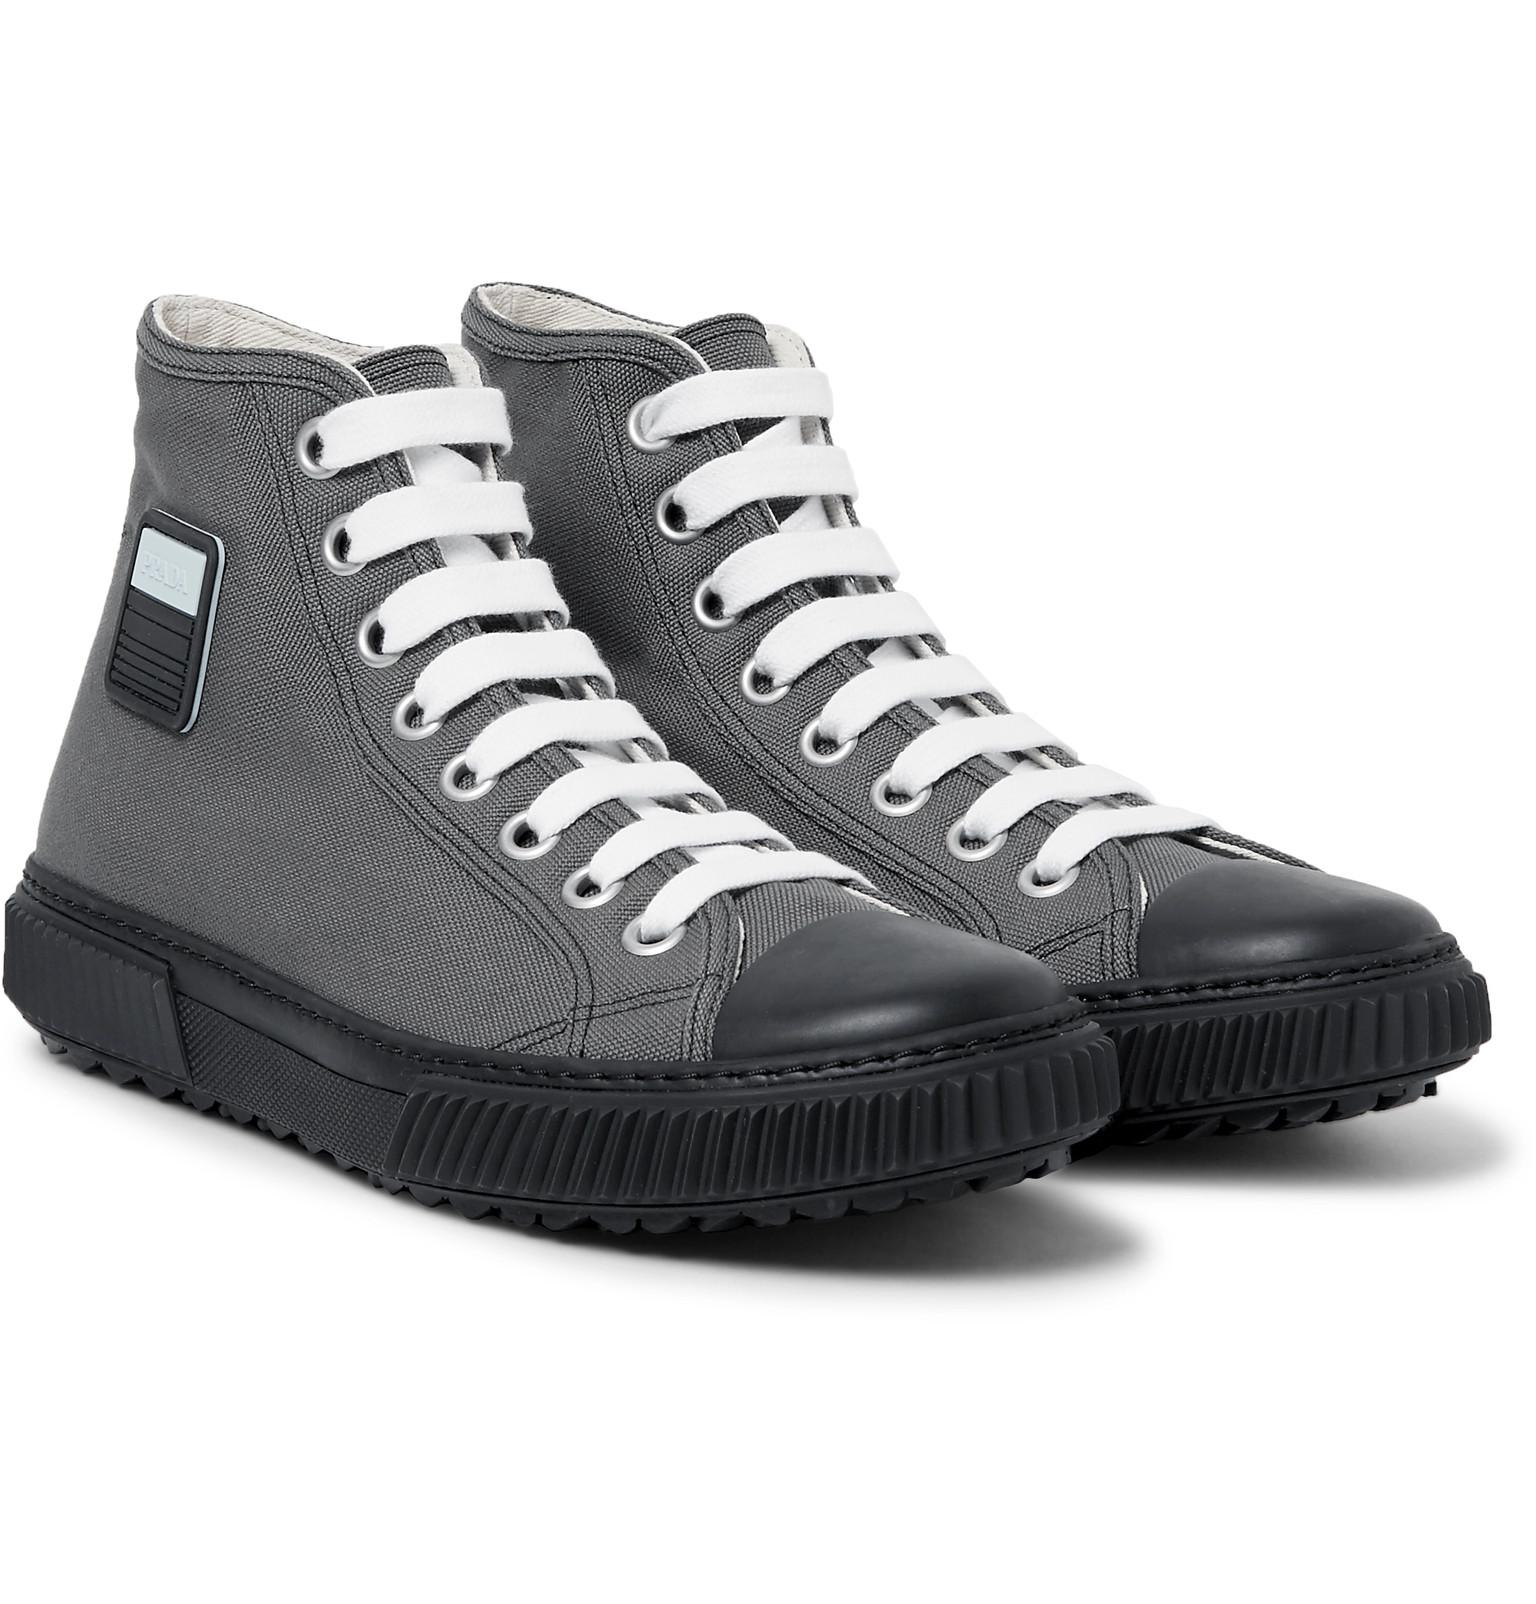 Prada Stratos Canvas High-top Sneakers